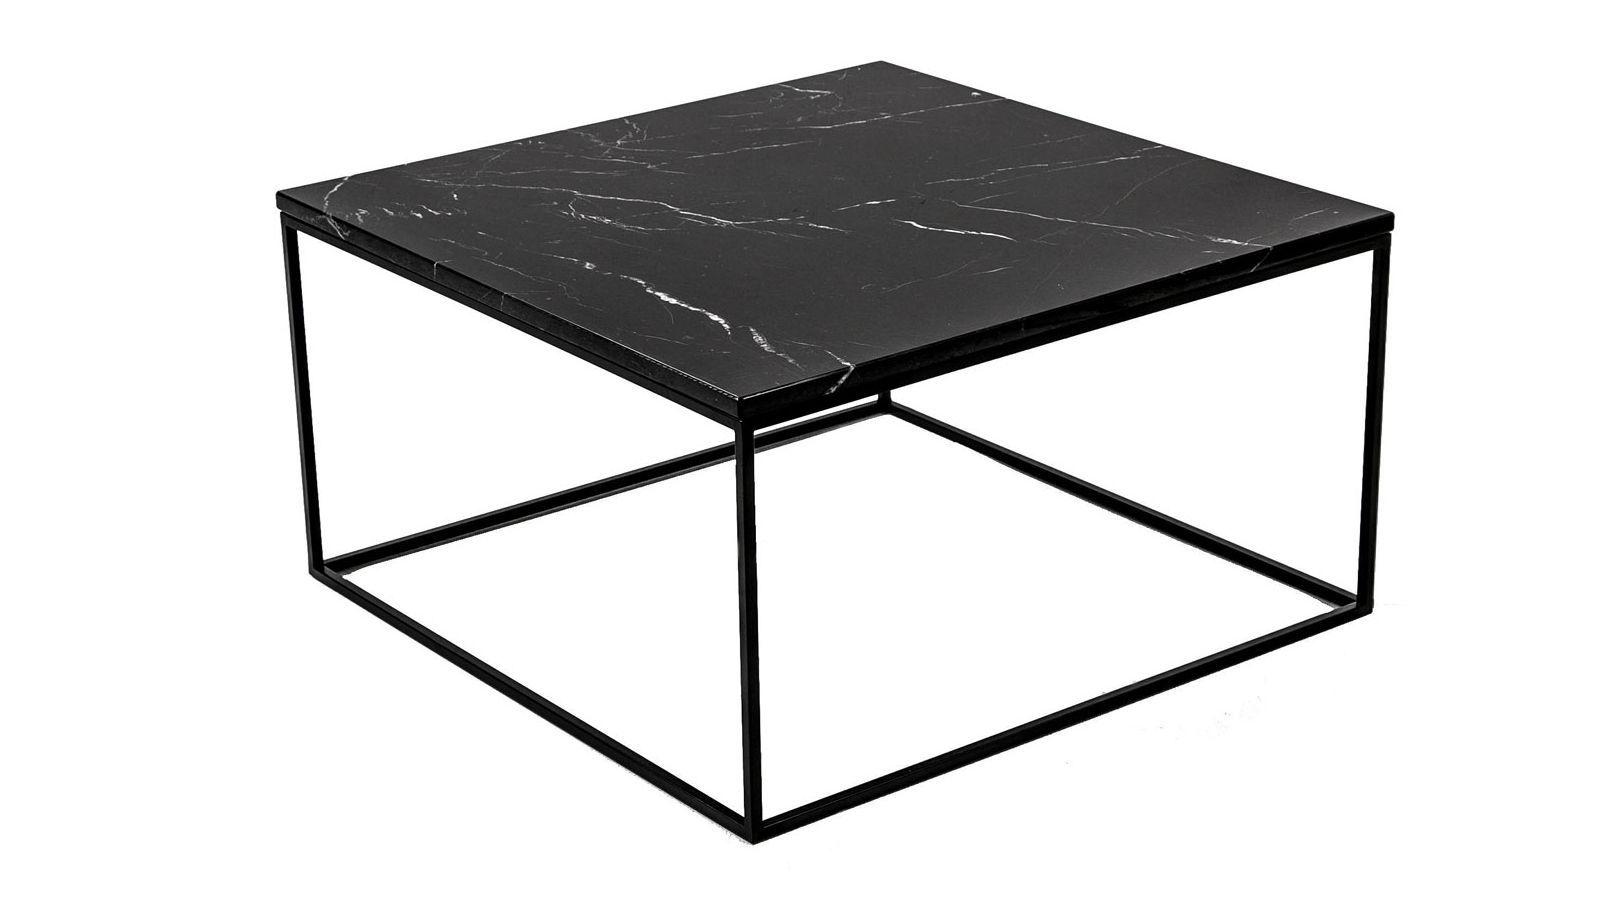 Svart marmorbord Soffbord, marmor, stålram, vardagsrum http  sweef se bord 174 jaguaren